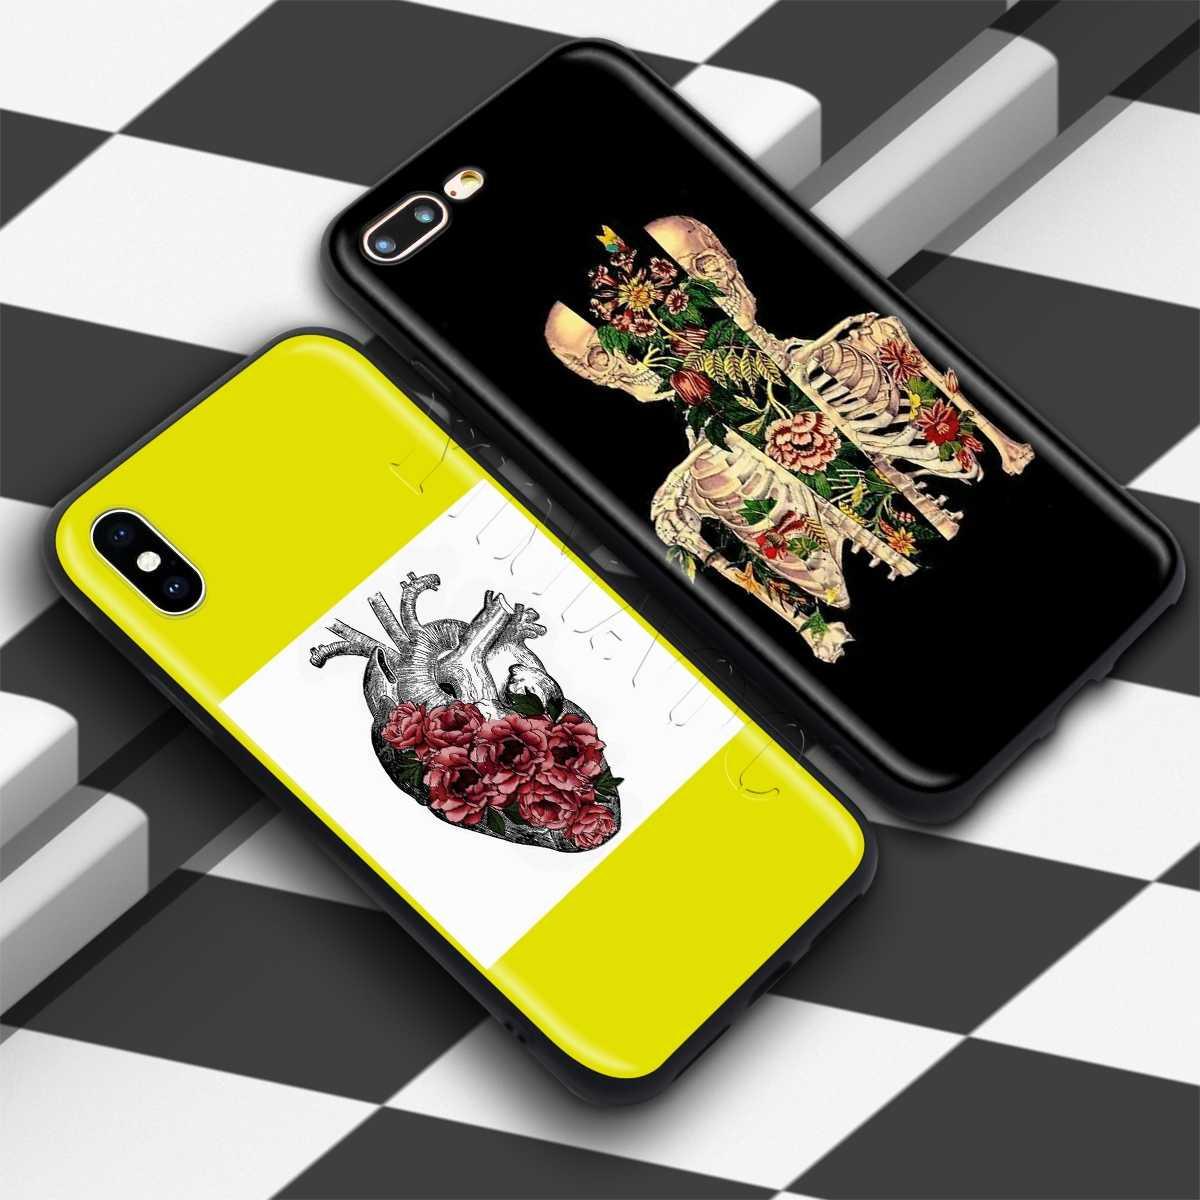 YIMAOC פרח לב אביב רך סיליקון מקרה עבור iPhone 11 פרו XS Max XR X 8 7 6 6S בתוספת 5 5S se